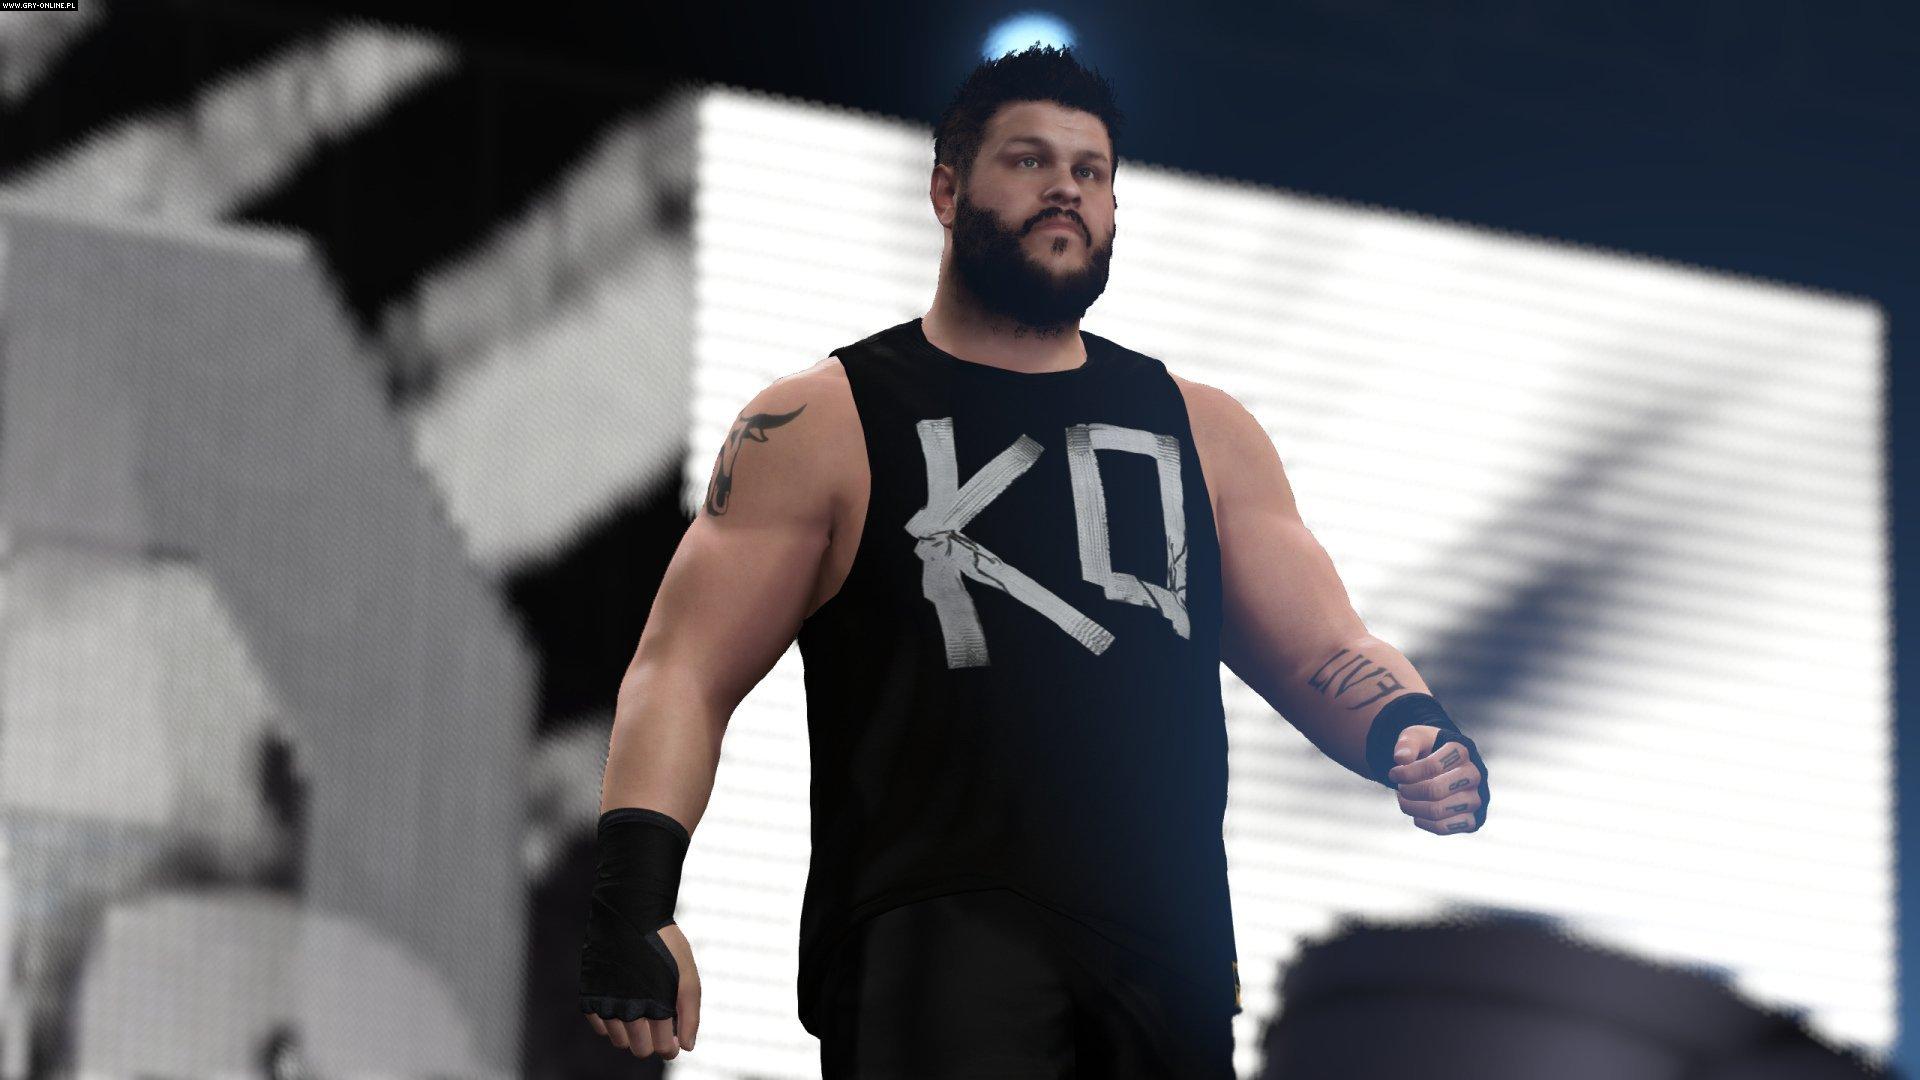 WWE 2K16 X360, PS3, XONE, PS4 Games Image 16/22, Yuke's, 2K Games